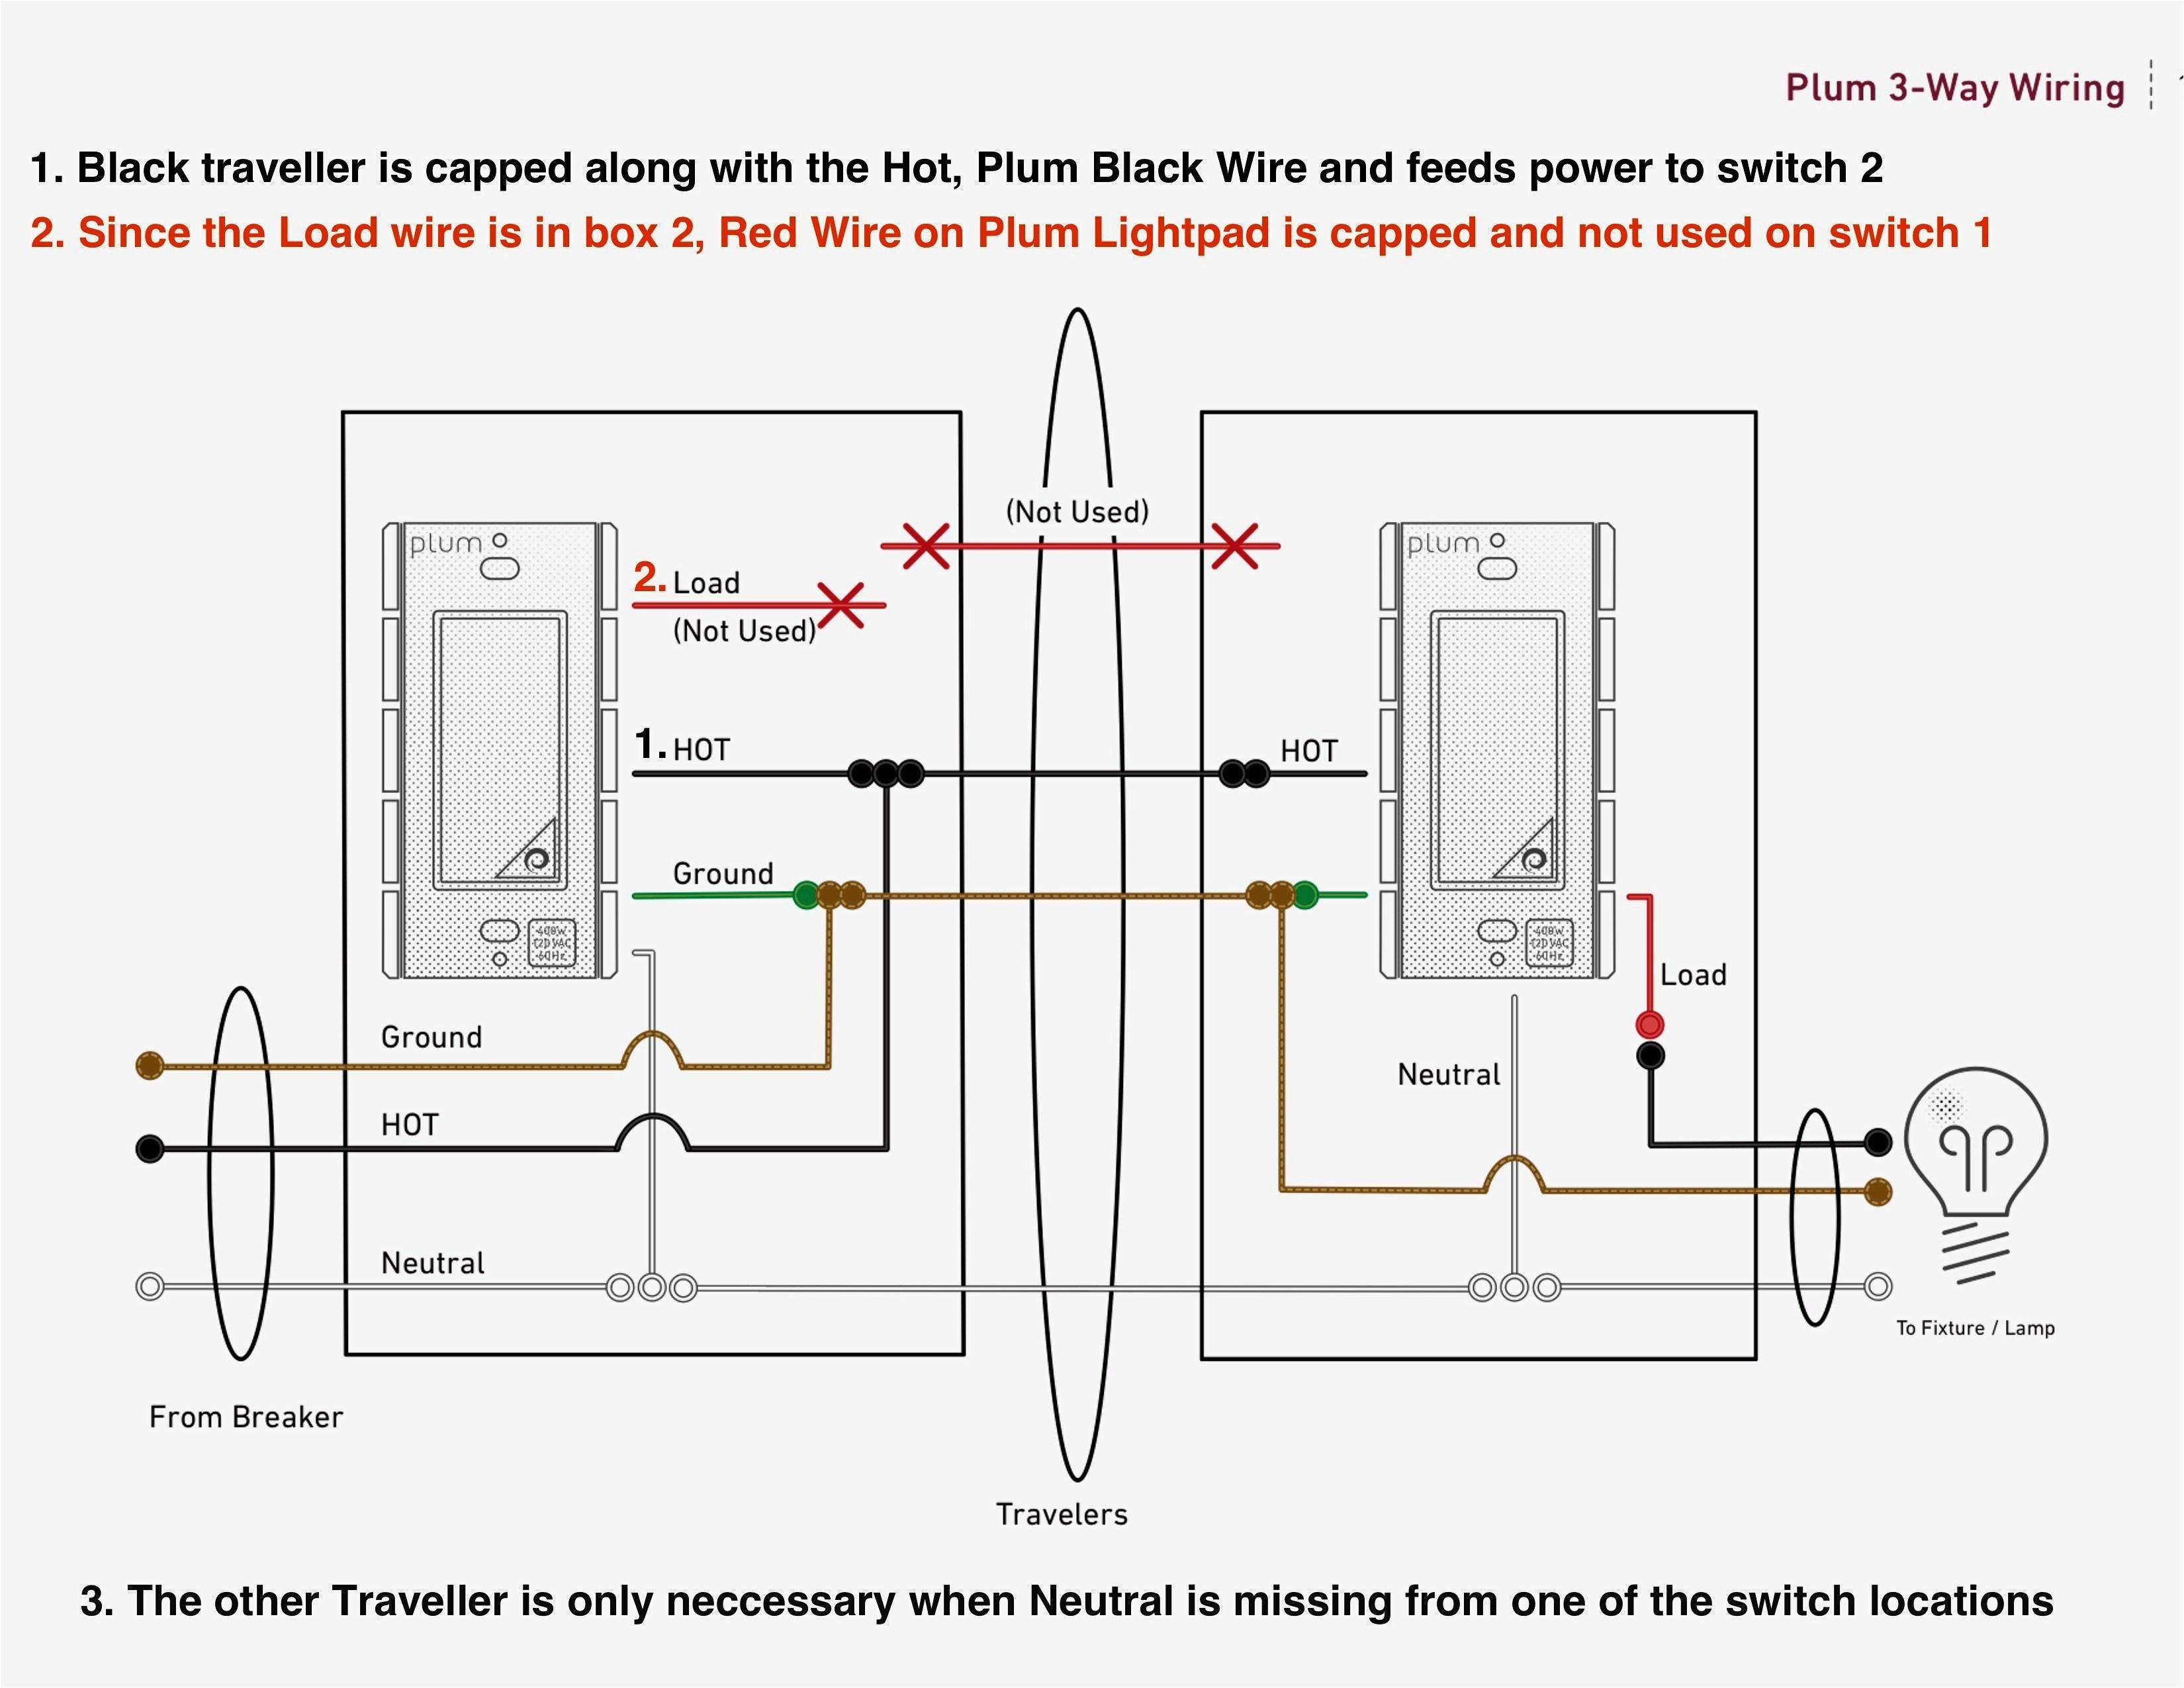 att uverse outage map unique diagram an att network auto electrical wiring diagram e280a2 jpg